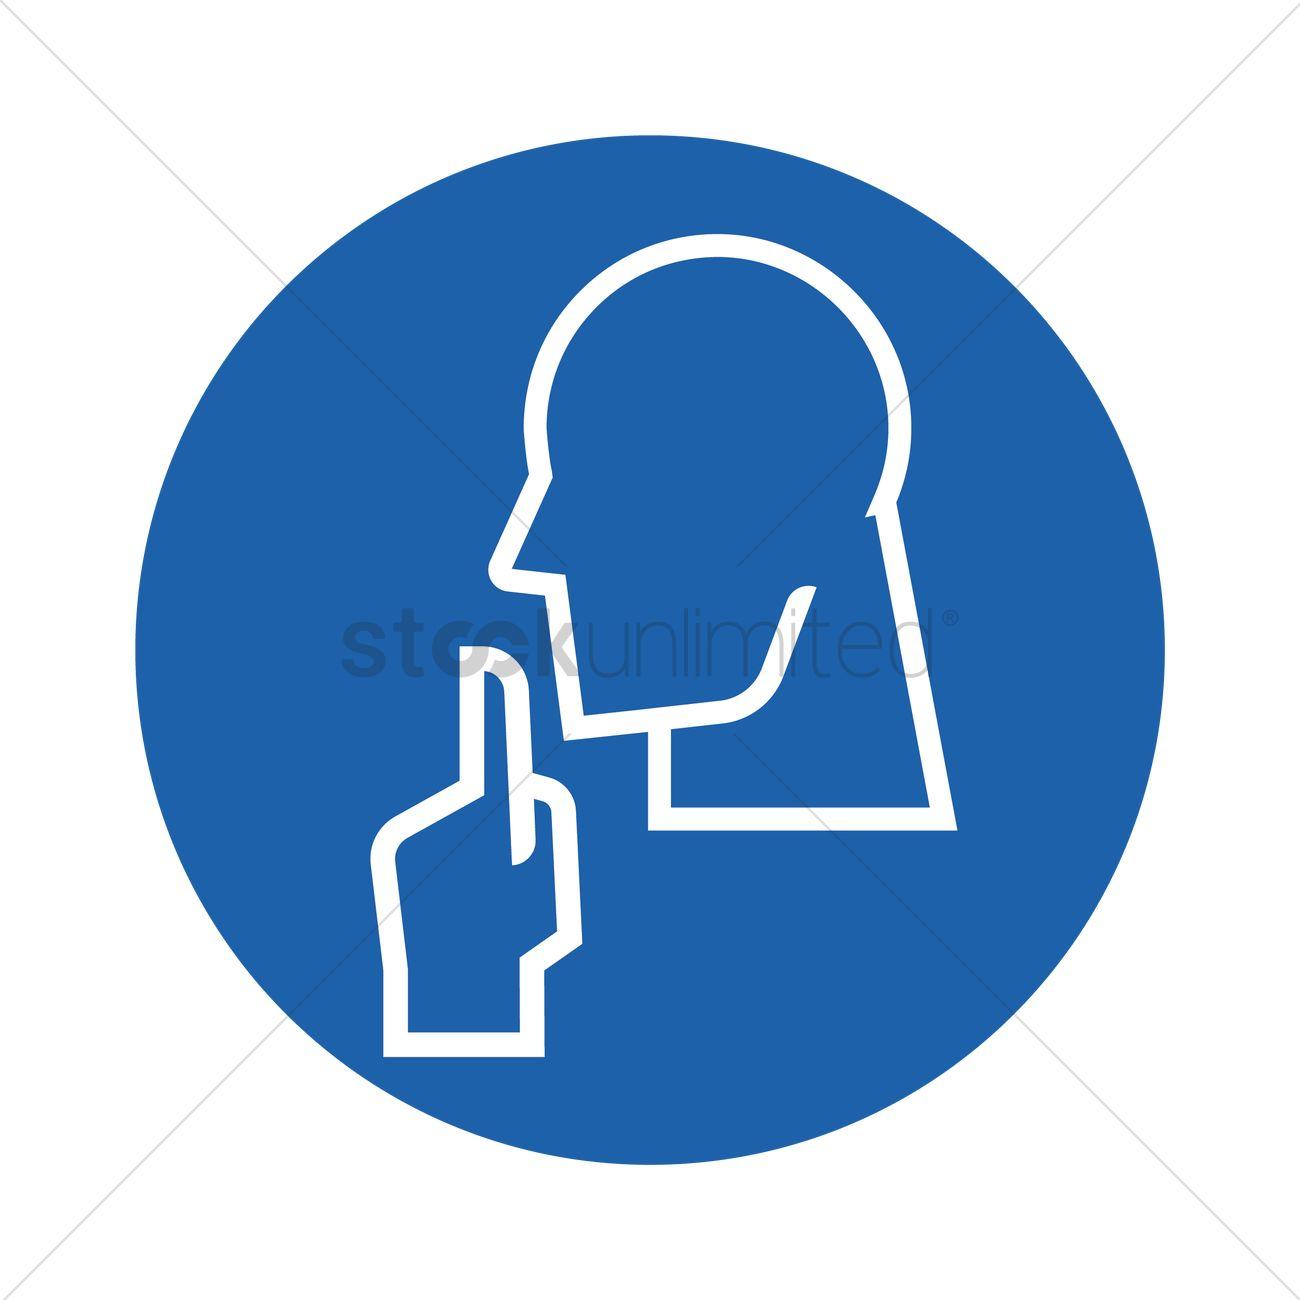 Please be quiet sign vector image 1505390 stockunlimited please be quiet sign vector graphic buycottarizona